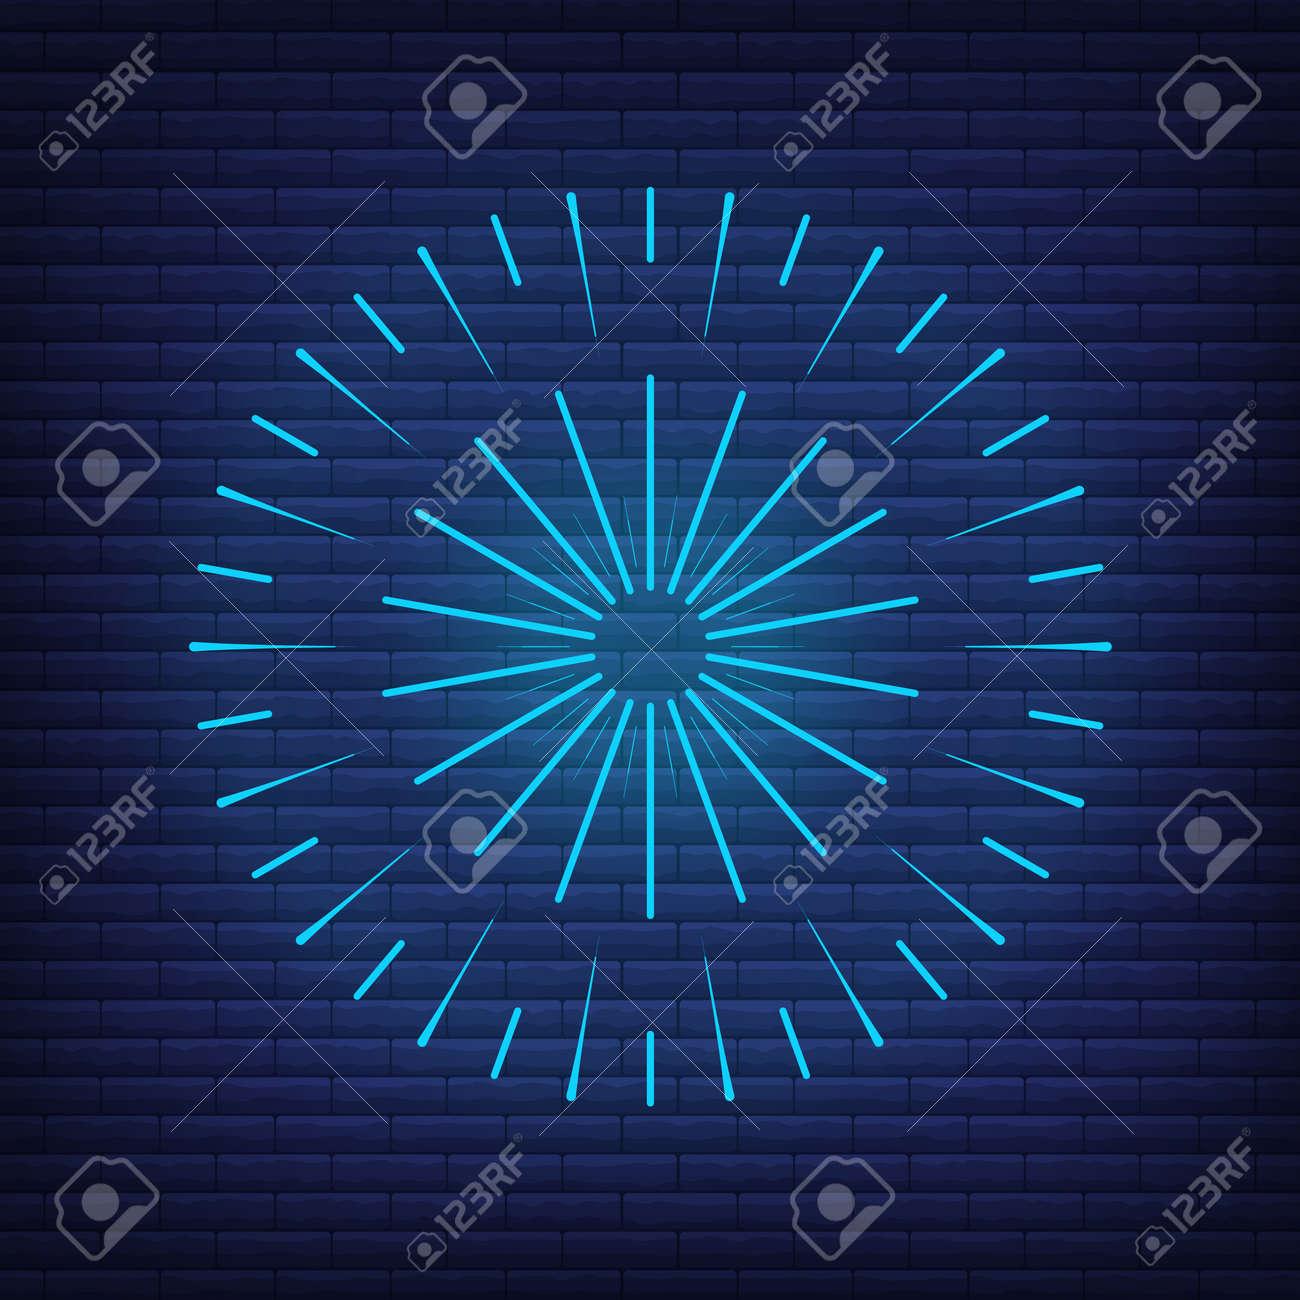 Retro design light sunburst neon style glow geometric shape, vintage rays sunlight explosion icon concept vector illustration, isolated on black wall. Minimal blue firework burst label, sunbeam badge. - 168394800